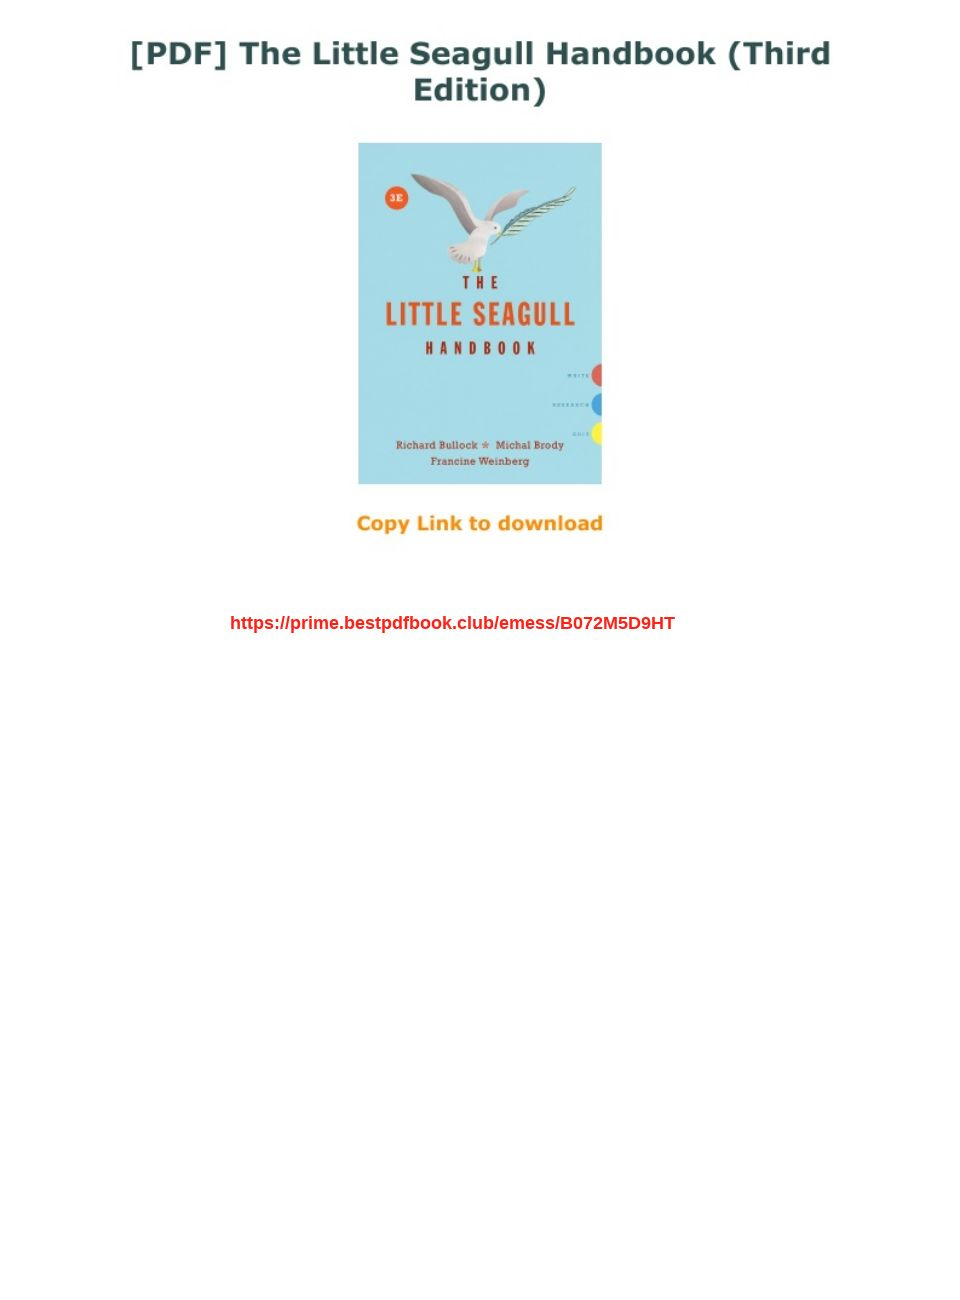 Little Seagull Handbook Pdf